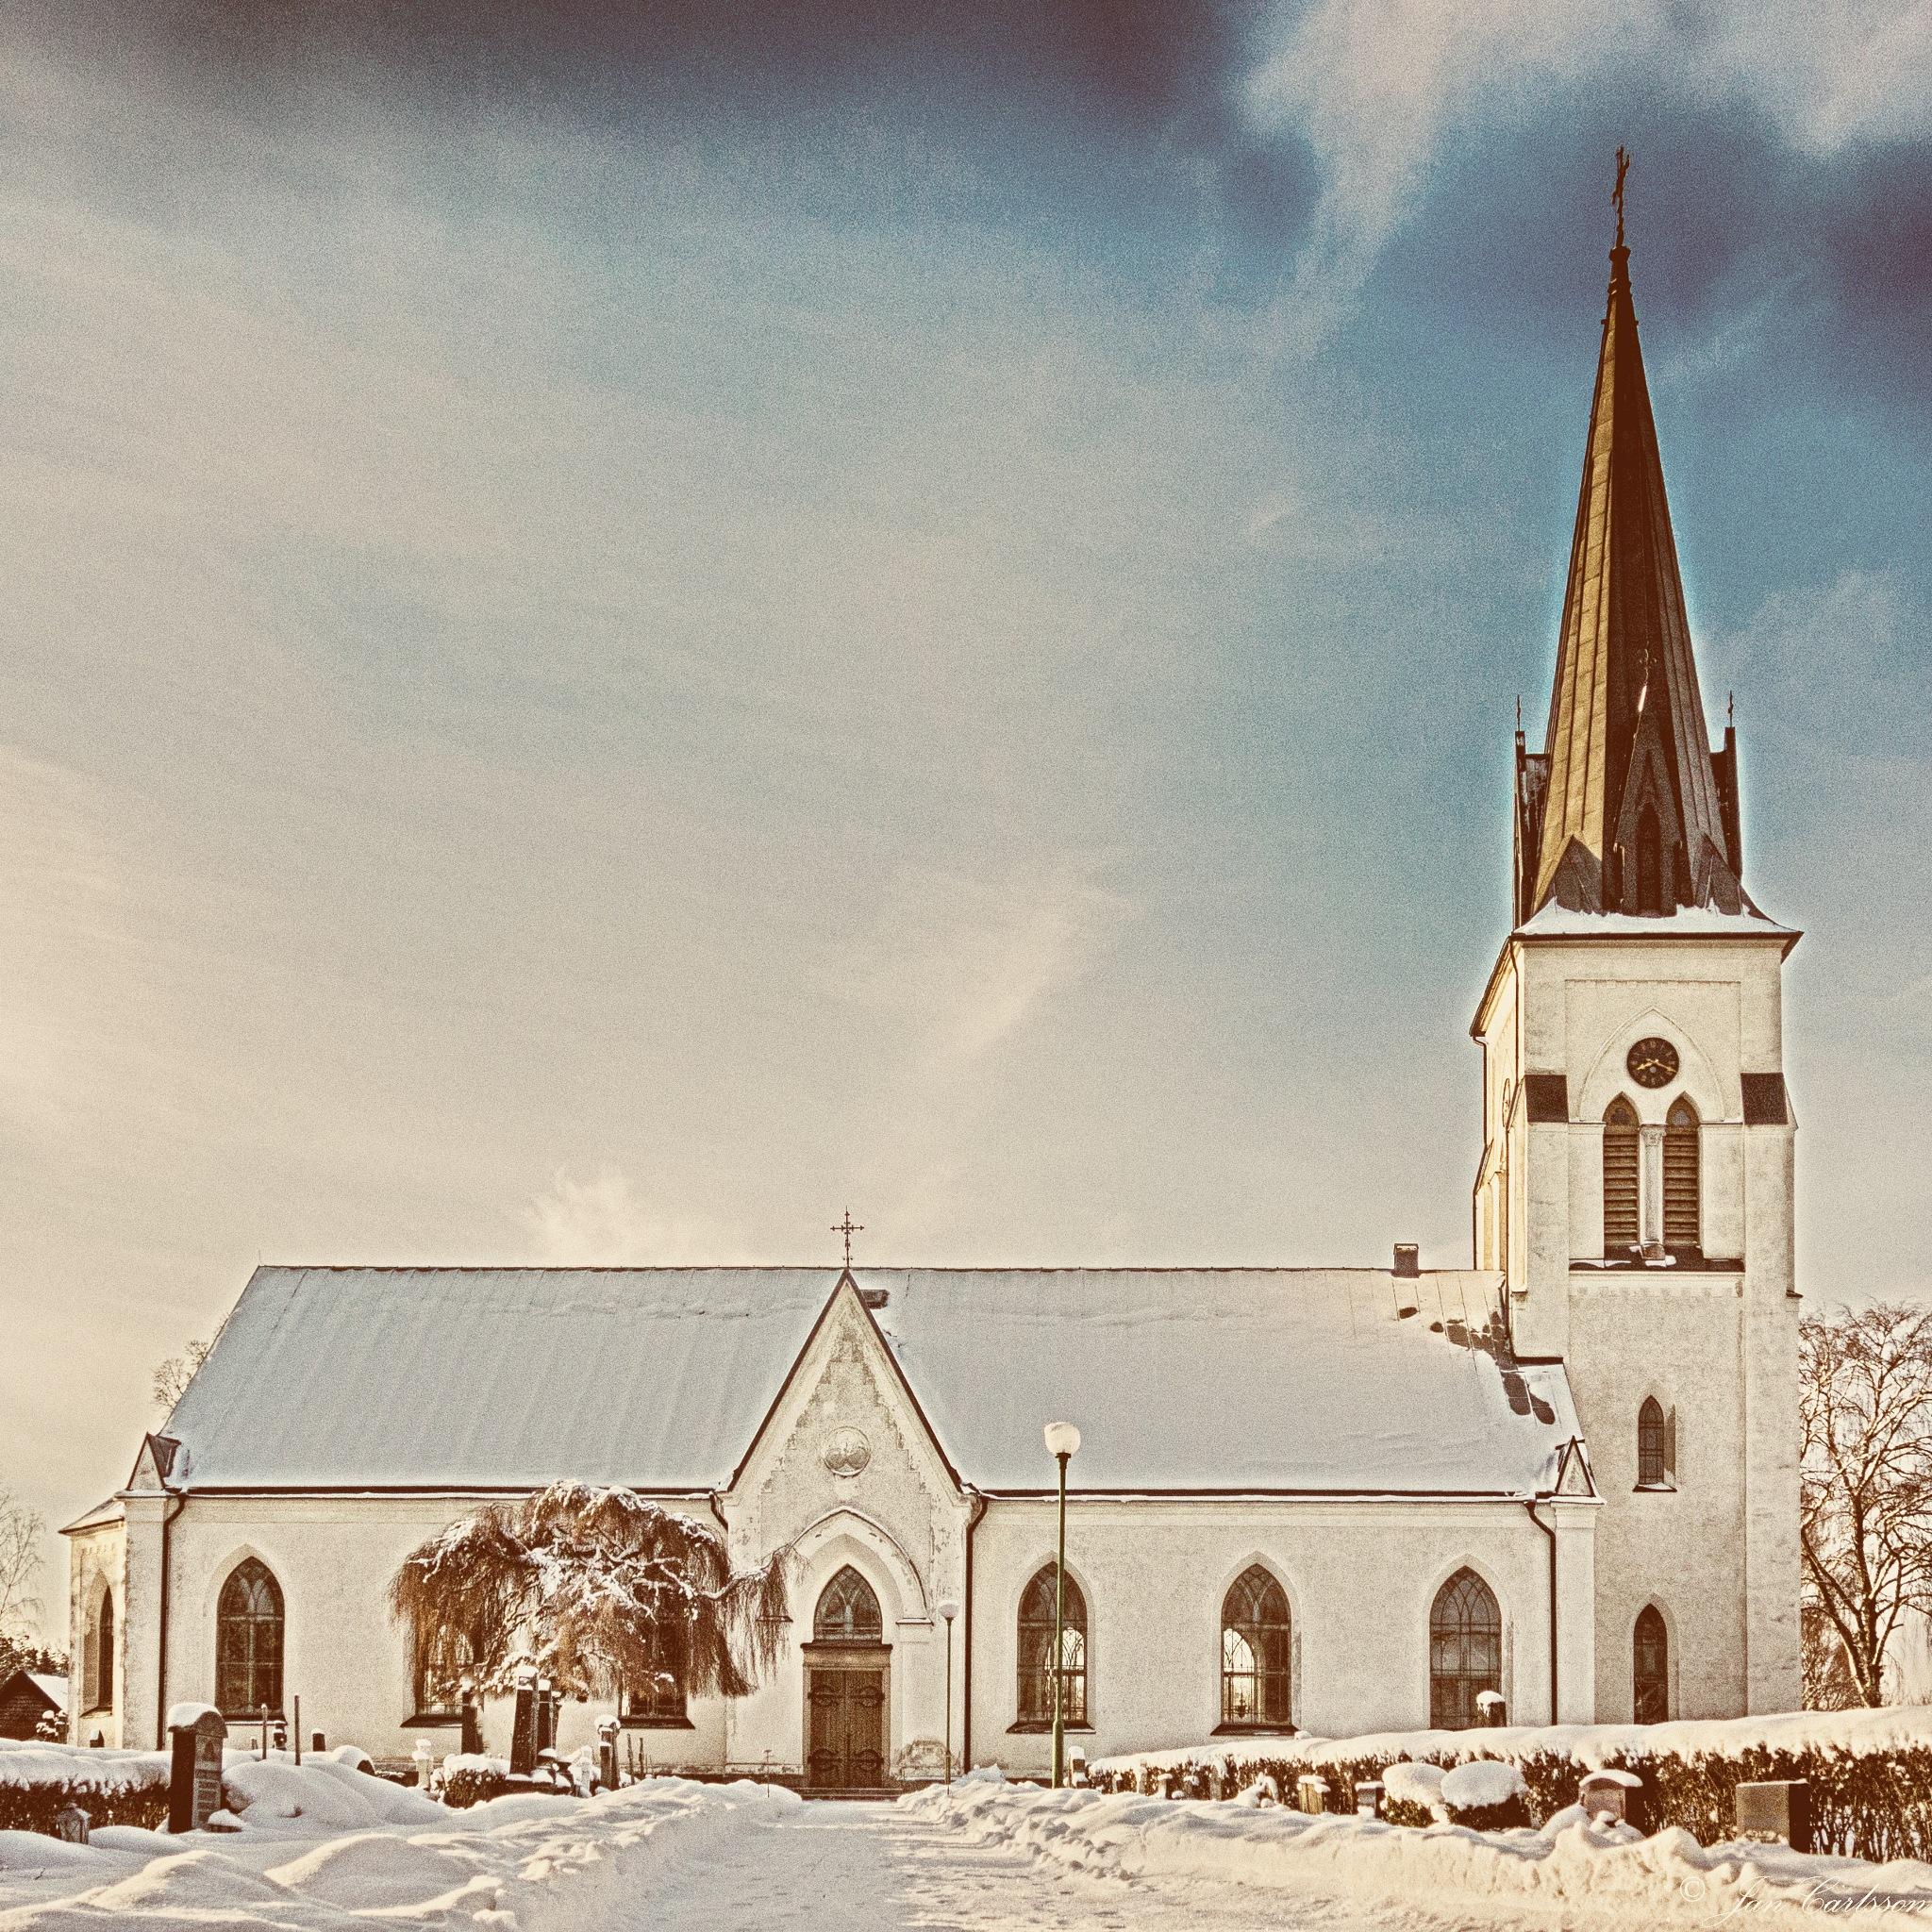 Architecture in Snow XVII by carljan w carlsson